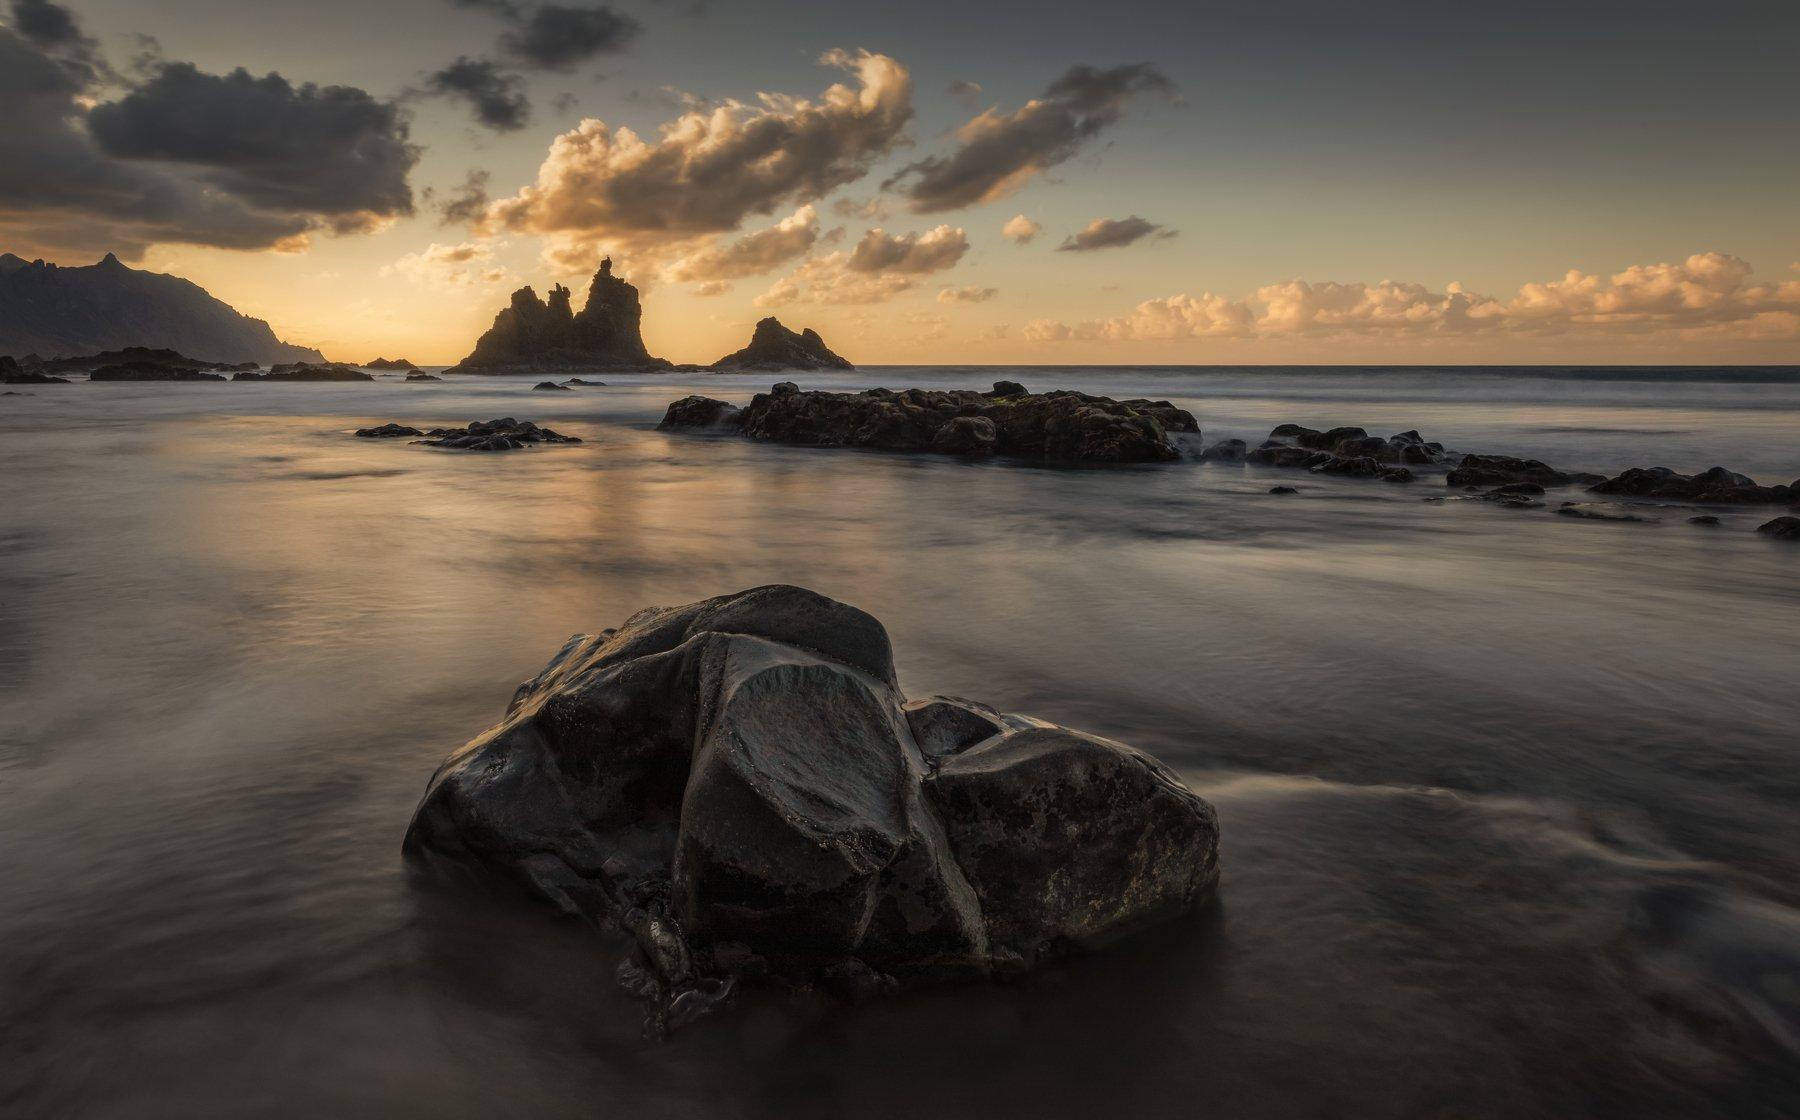 камни, пляж, океан, Alexandr Bezmolitvenny